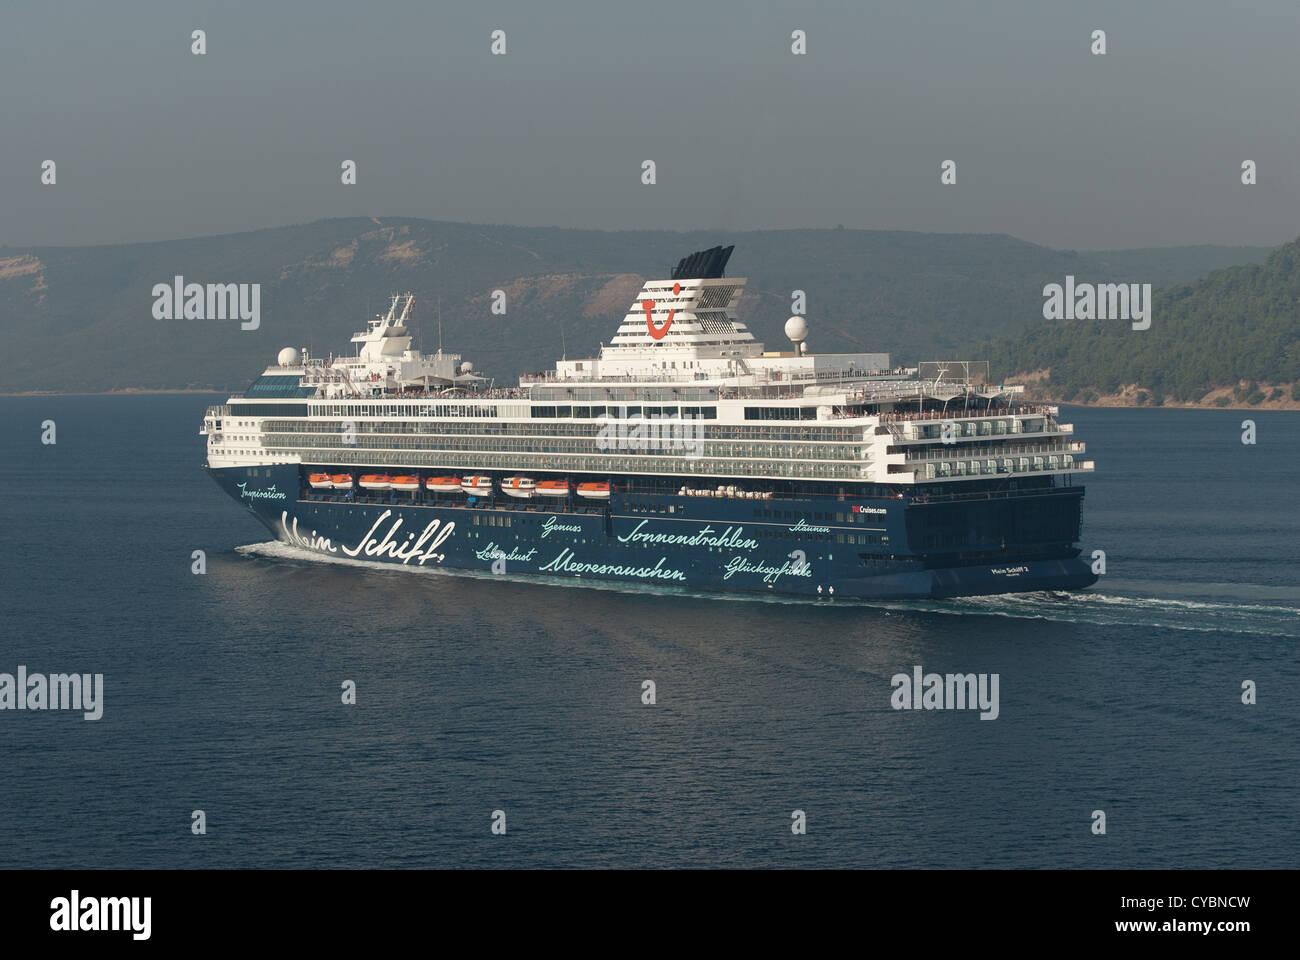 Cruise Liner Mein Schiff 2 cruising the Dardanelles - Stock Image